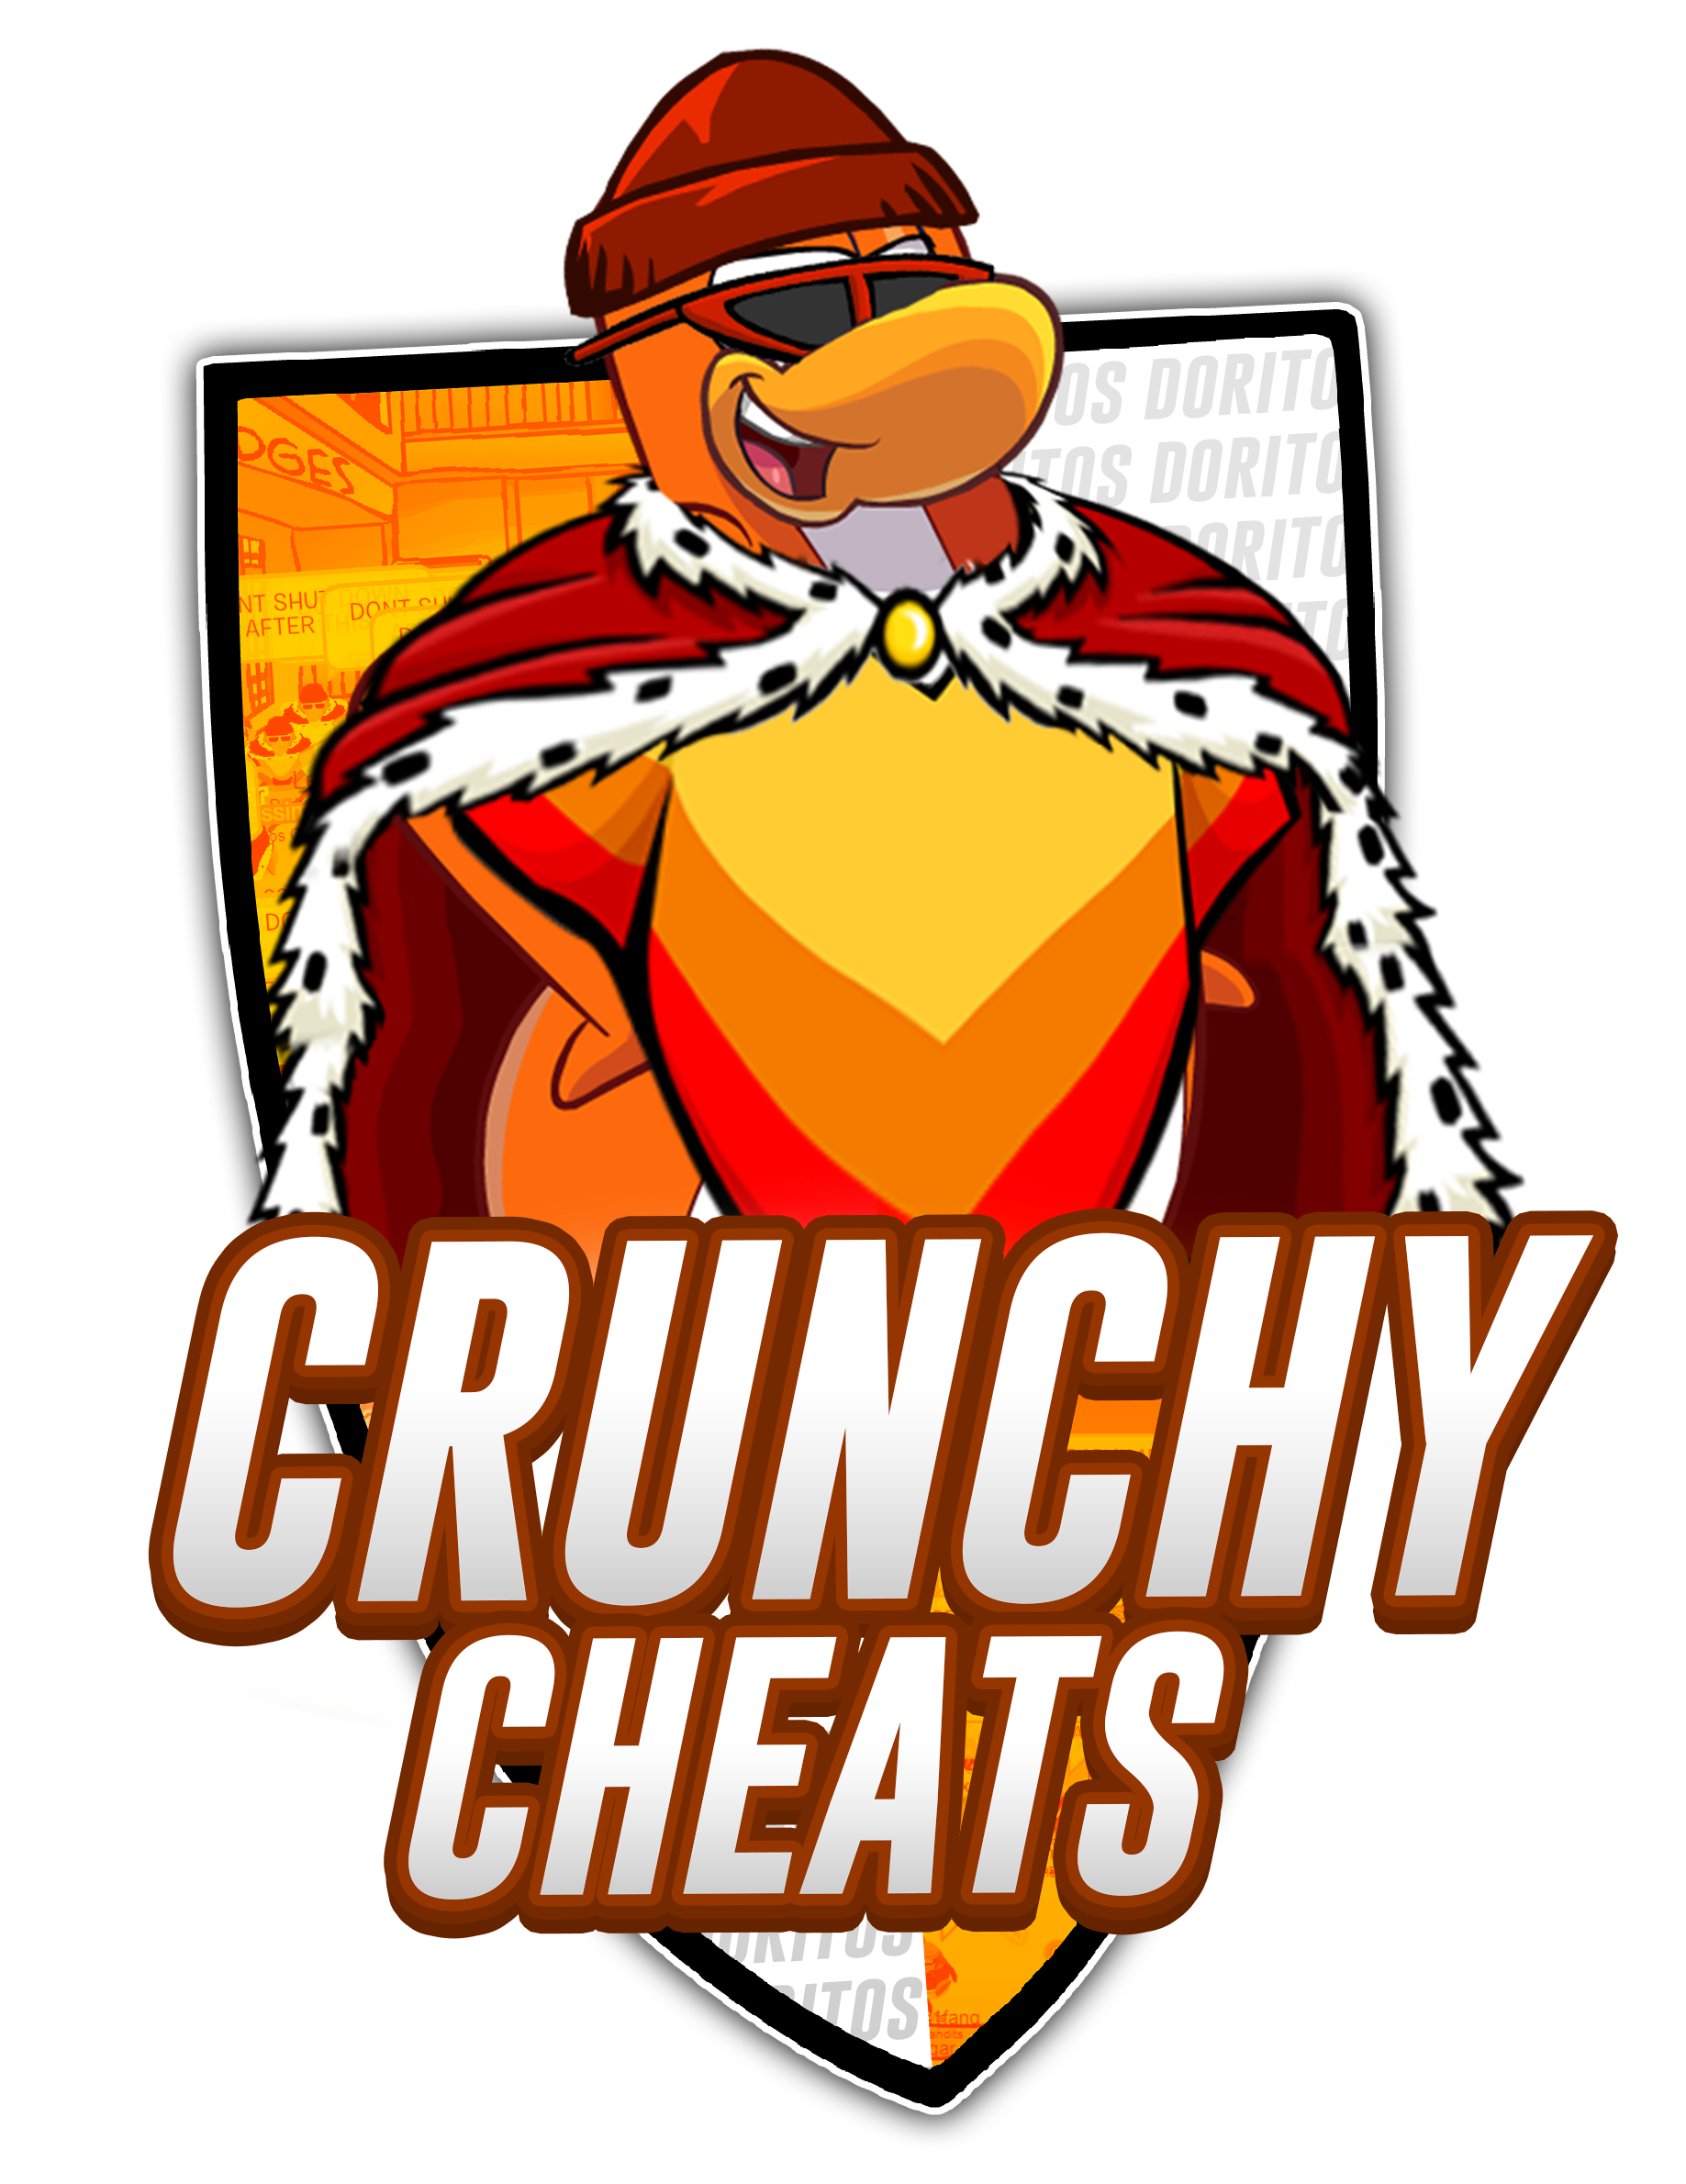 dcp-crunchy-cheats